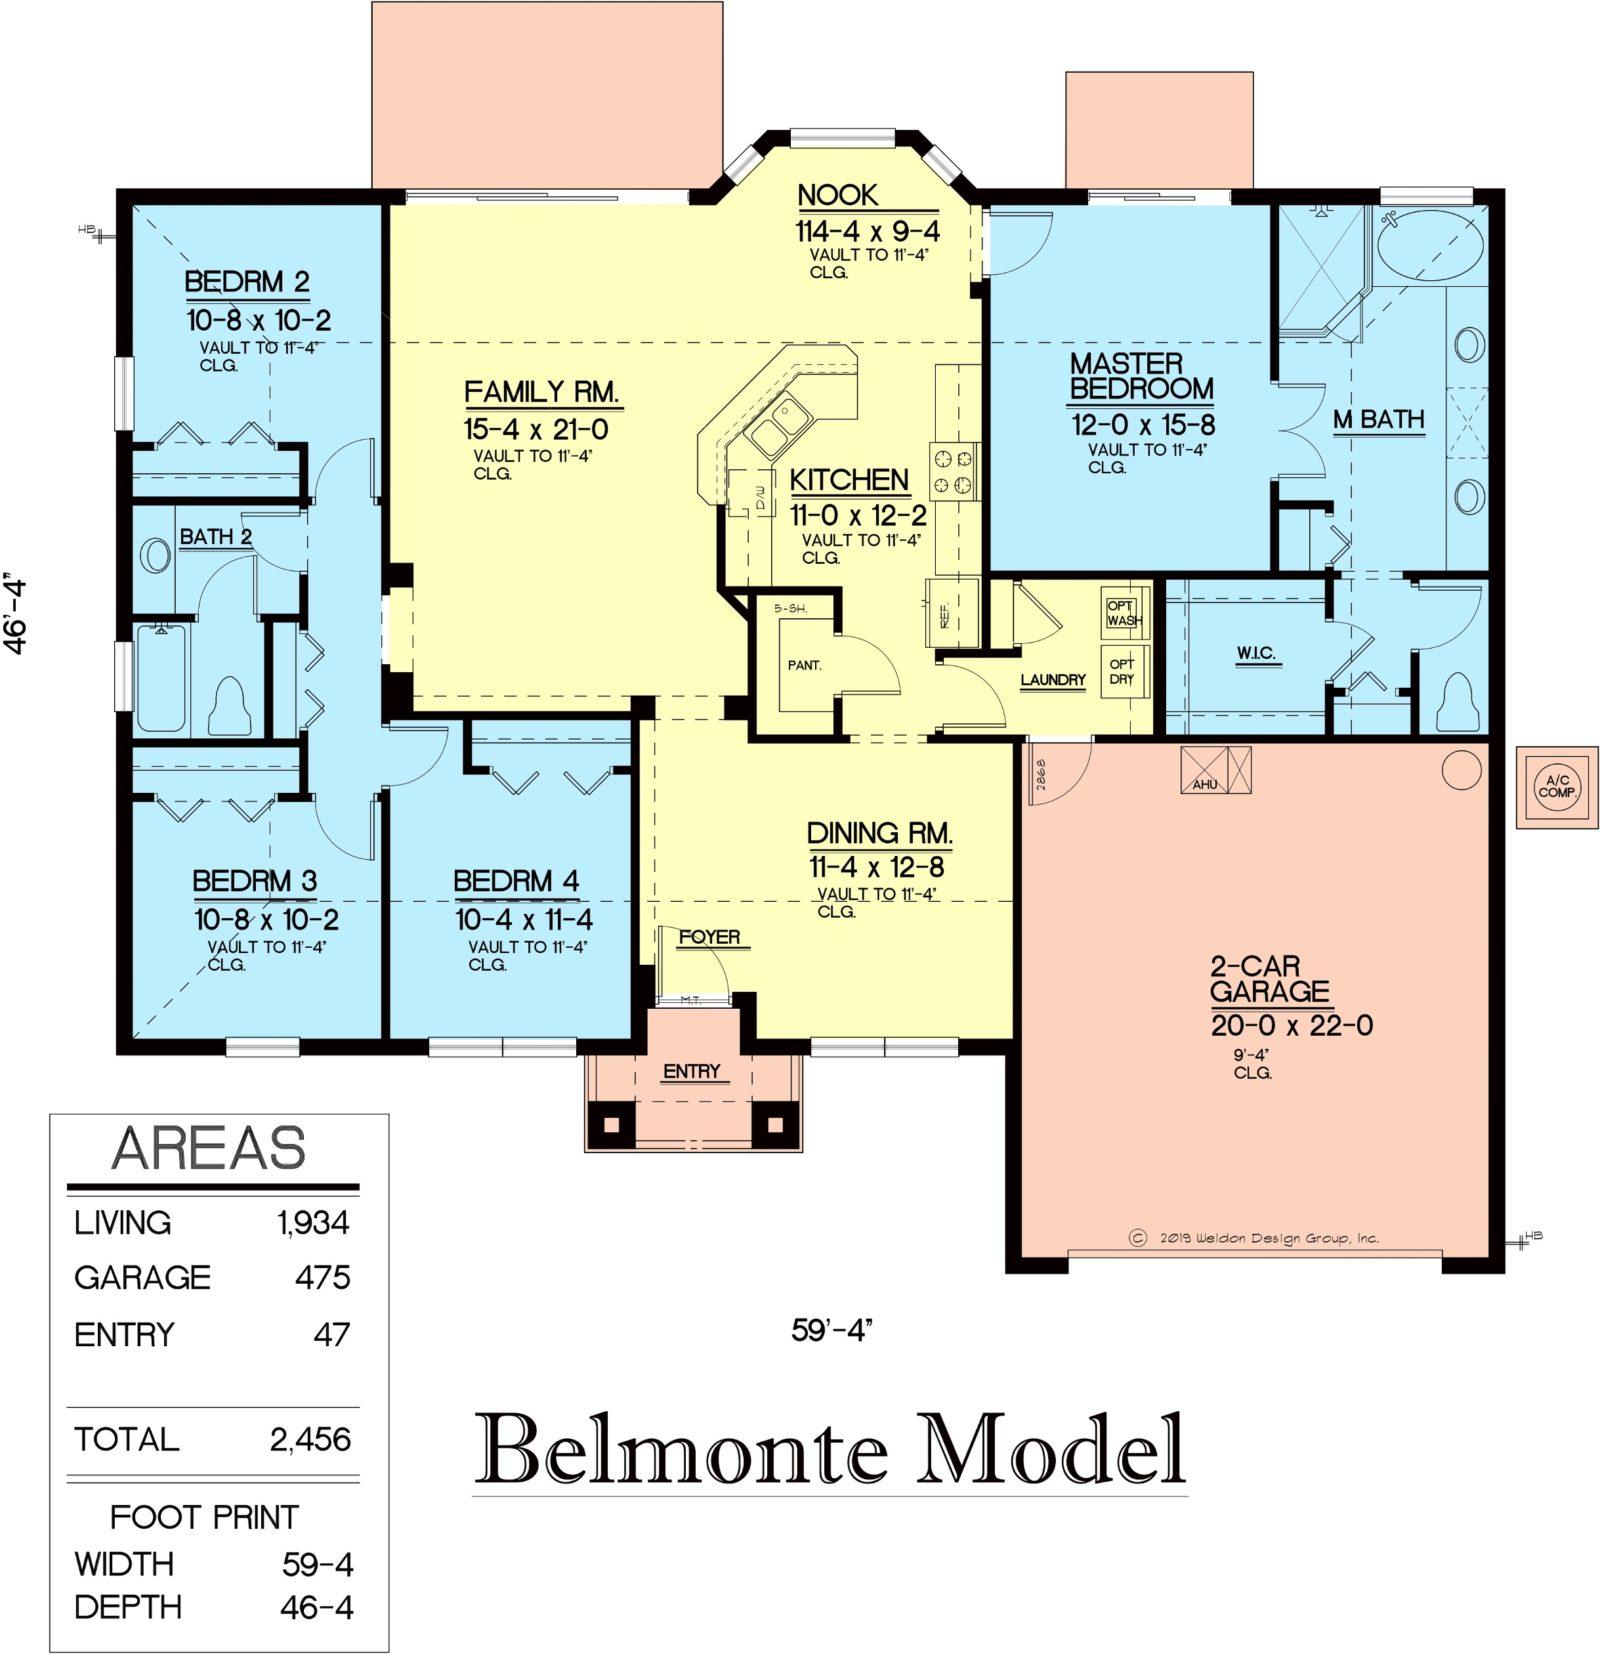 81-Belmonte-FloorPlan-500